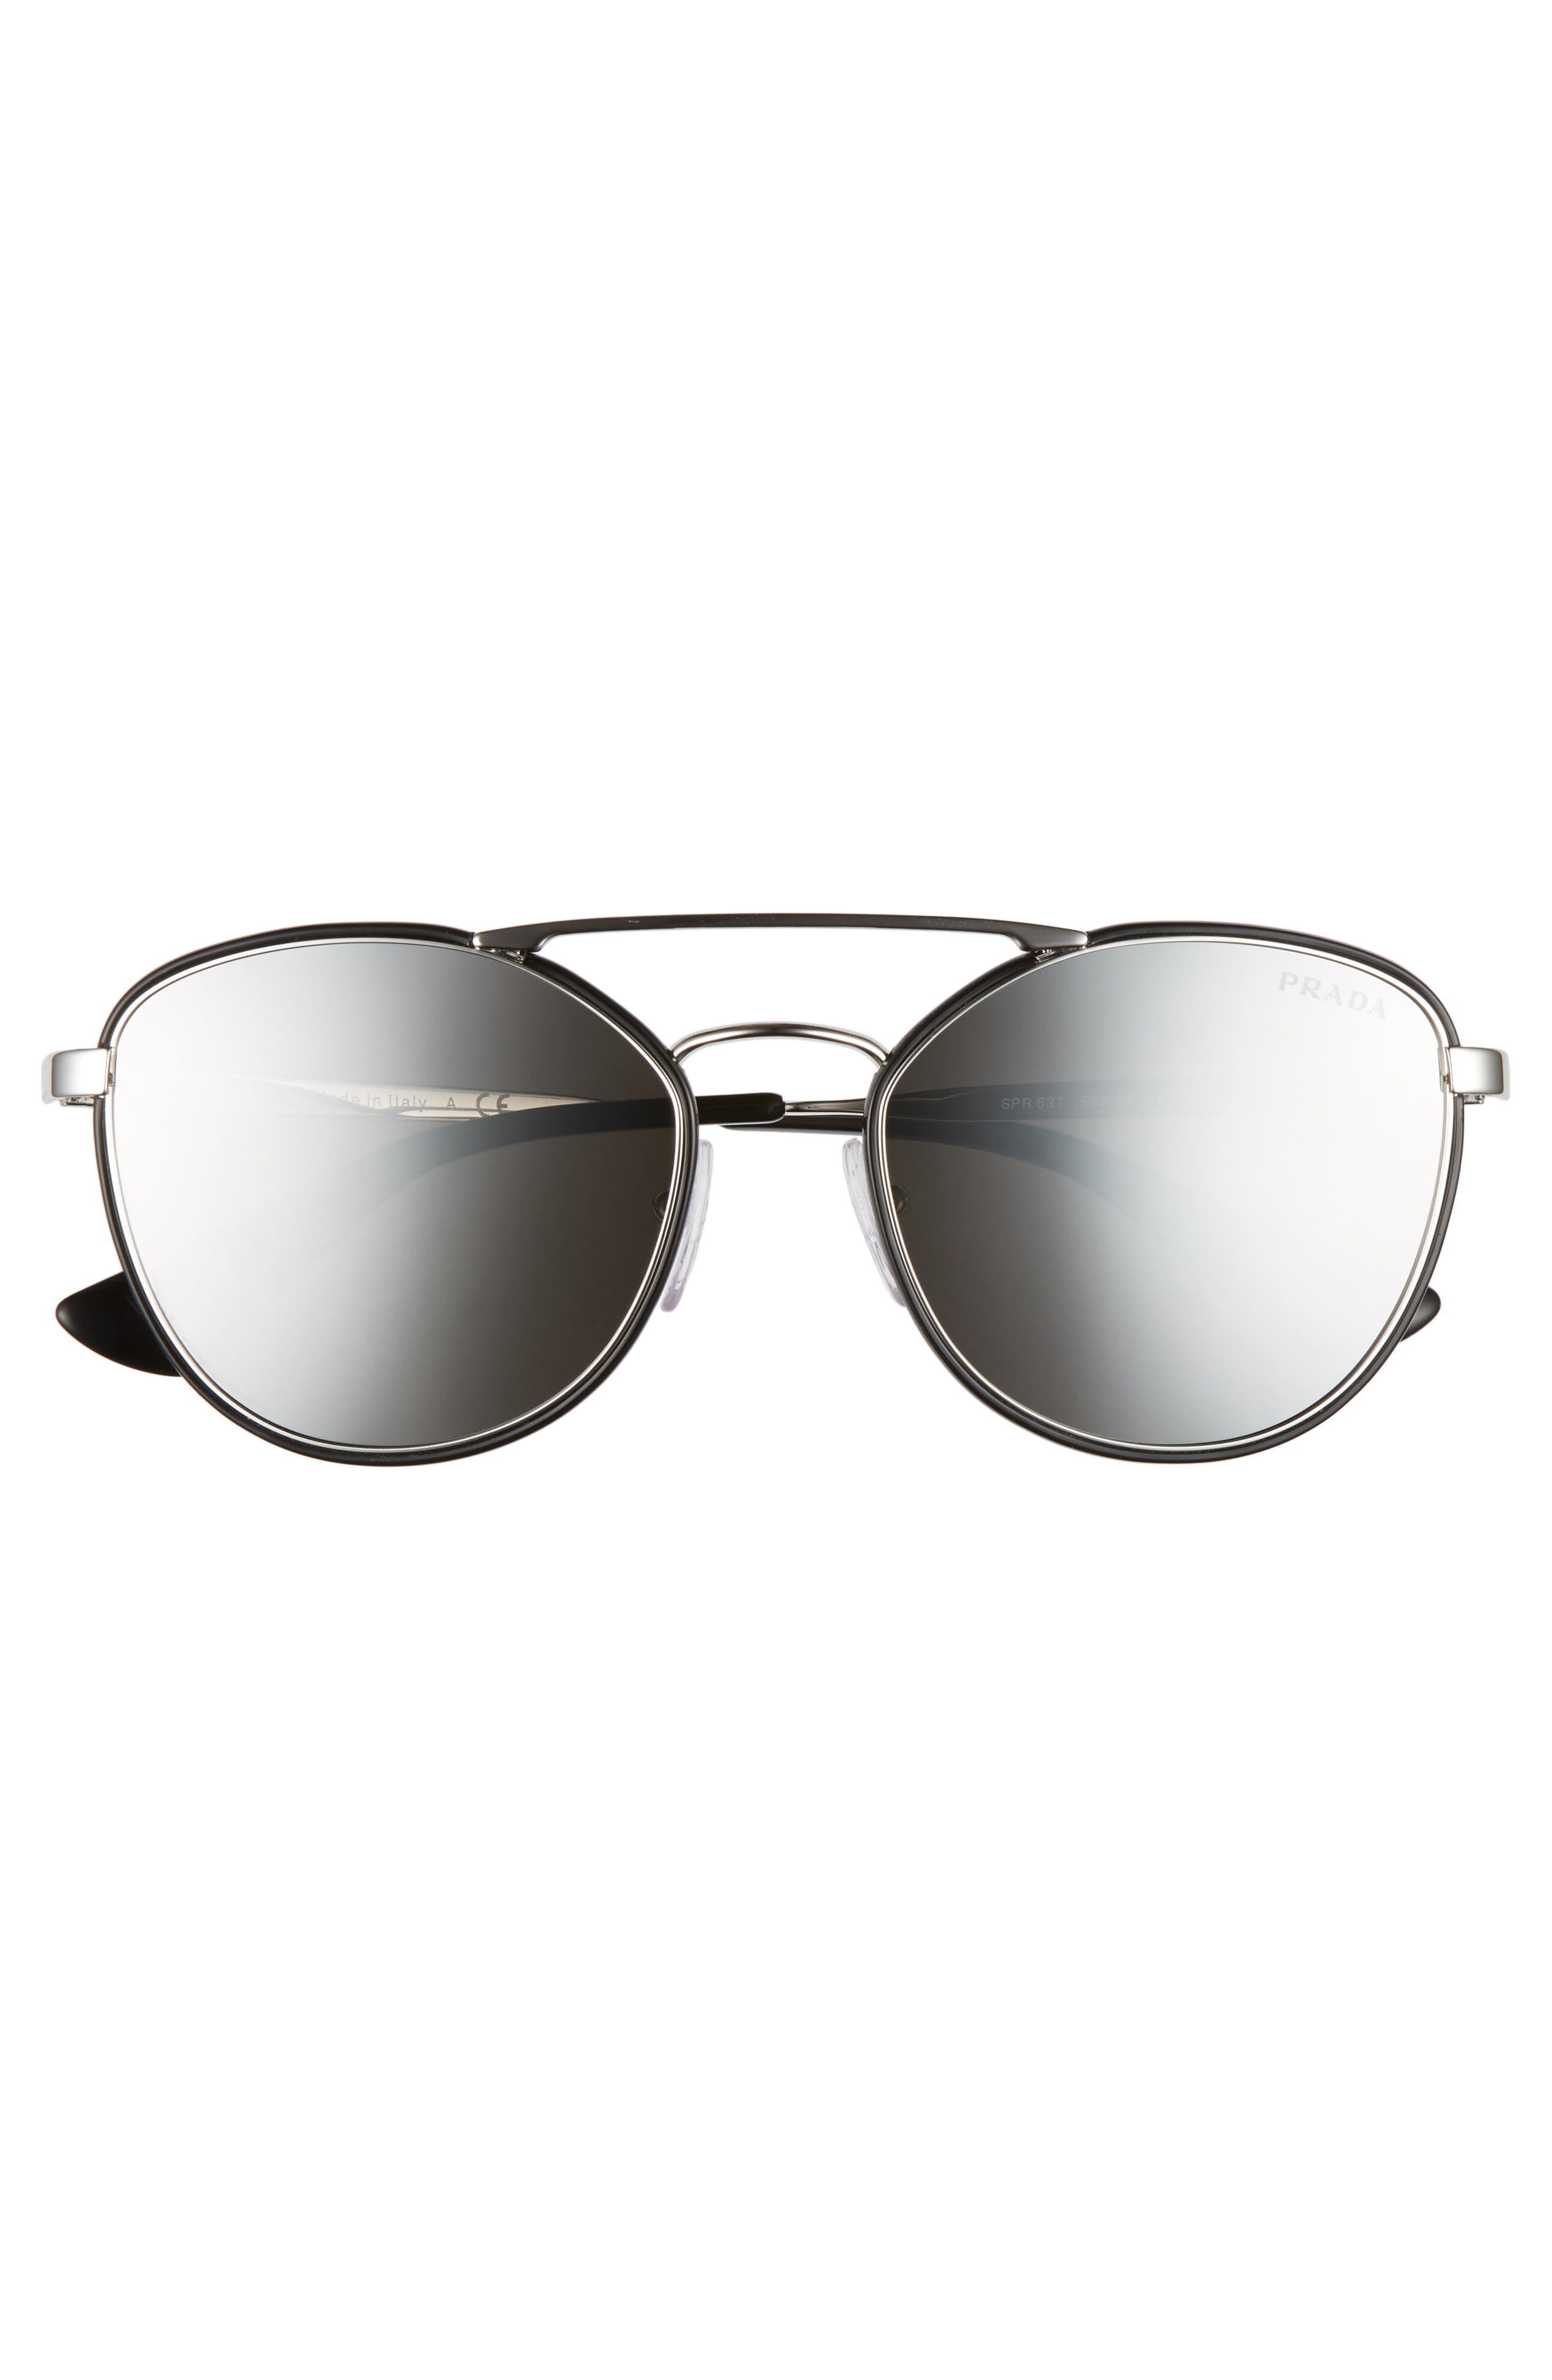 55mm Mirrored Aviator Sunglasses,                             Alternate thumbnail 3, color,                             001